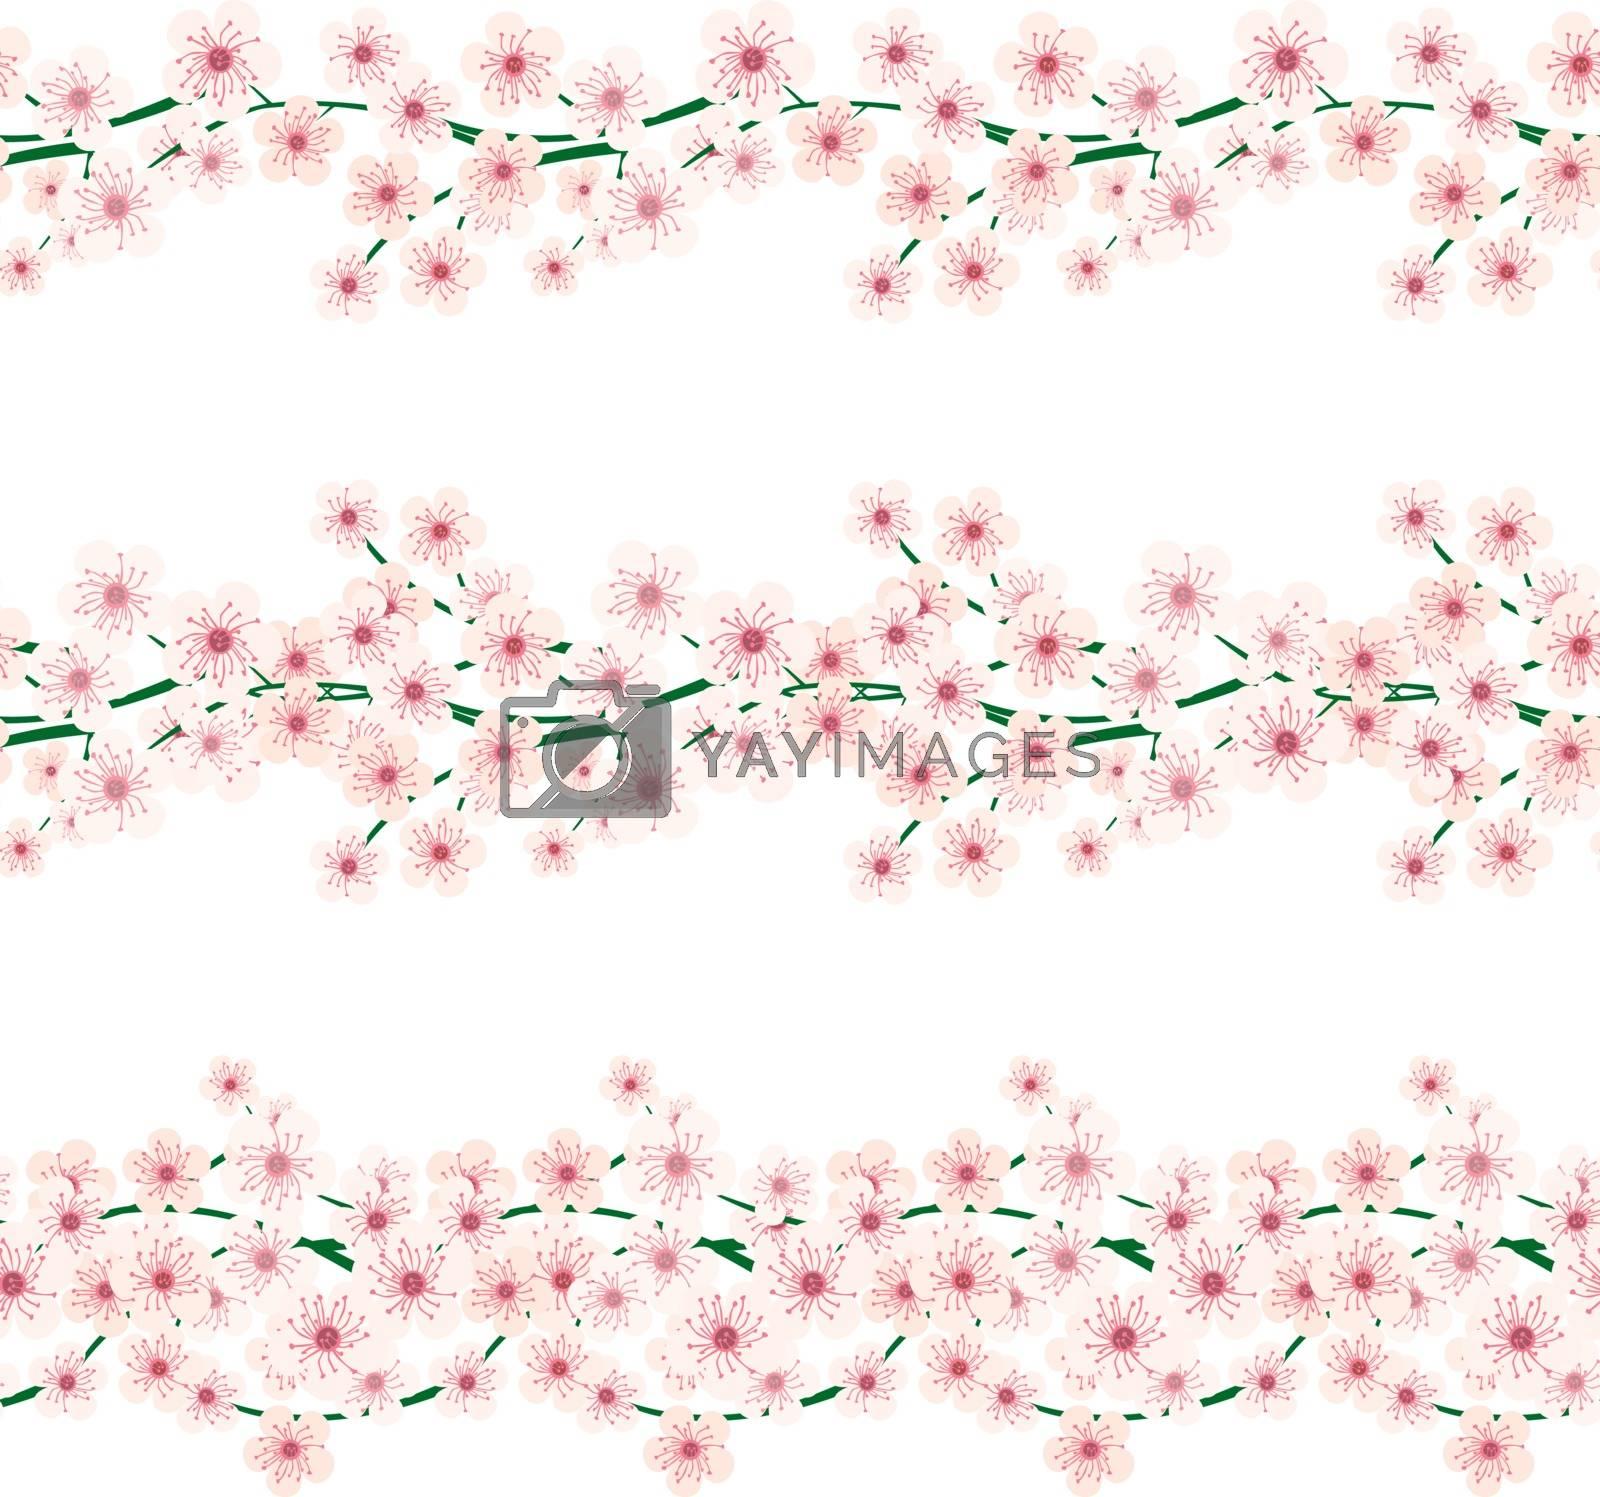 Set of three illustrated decorative floral borders